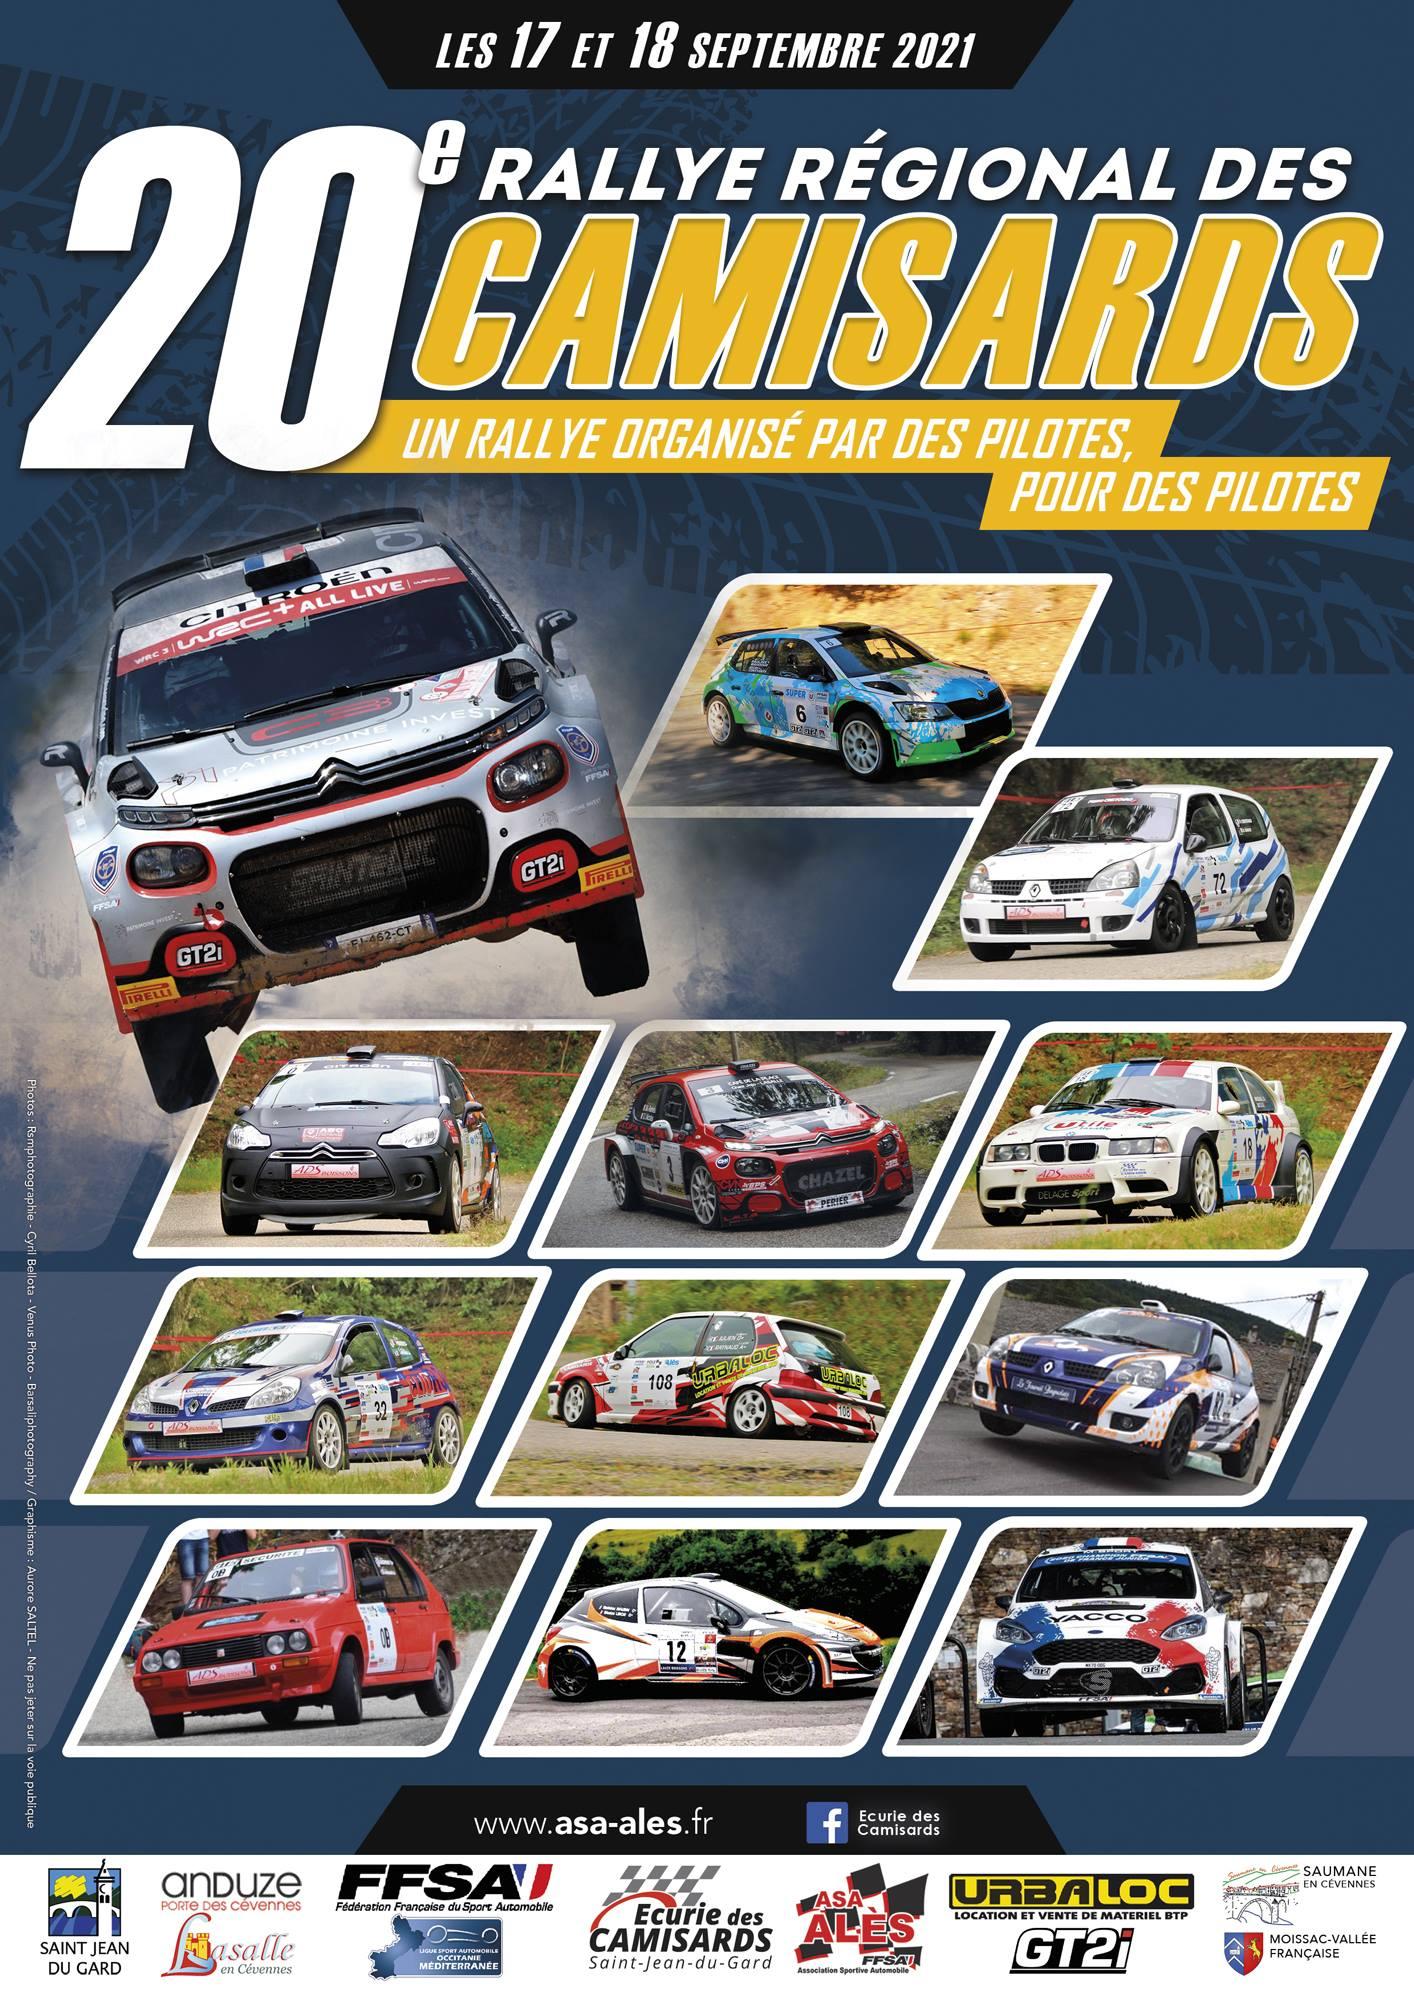 Rallye-des-Camisards-2021-Affiche.jpeg